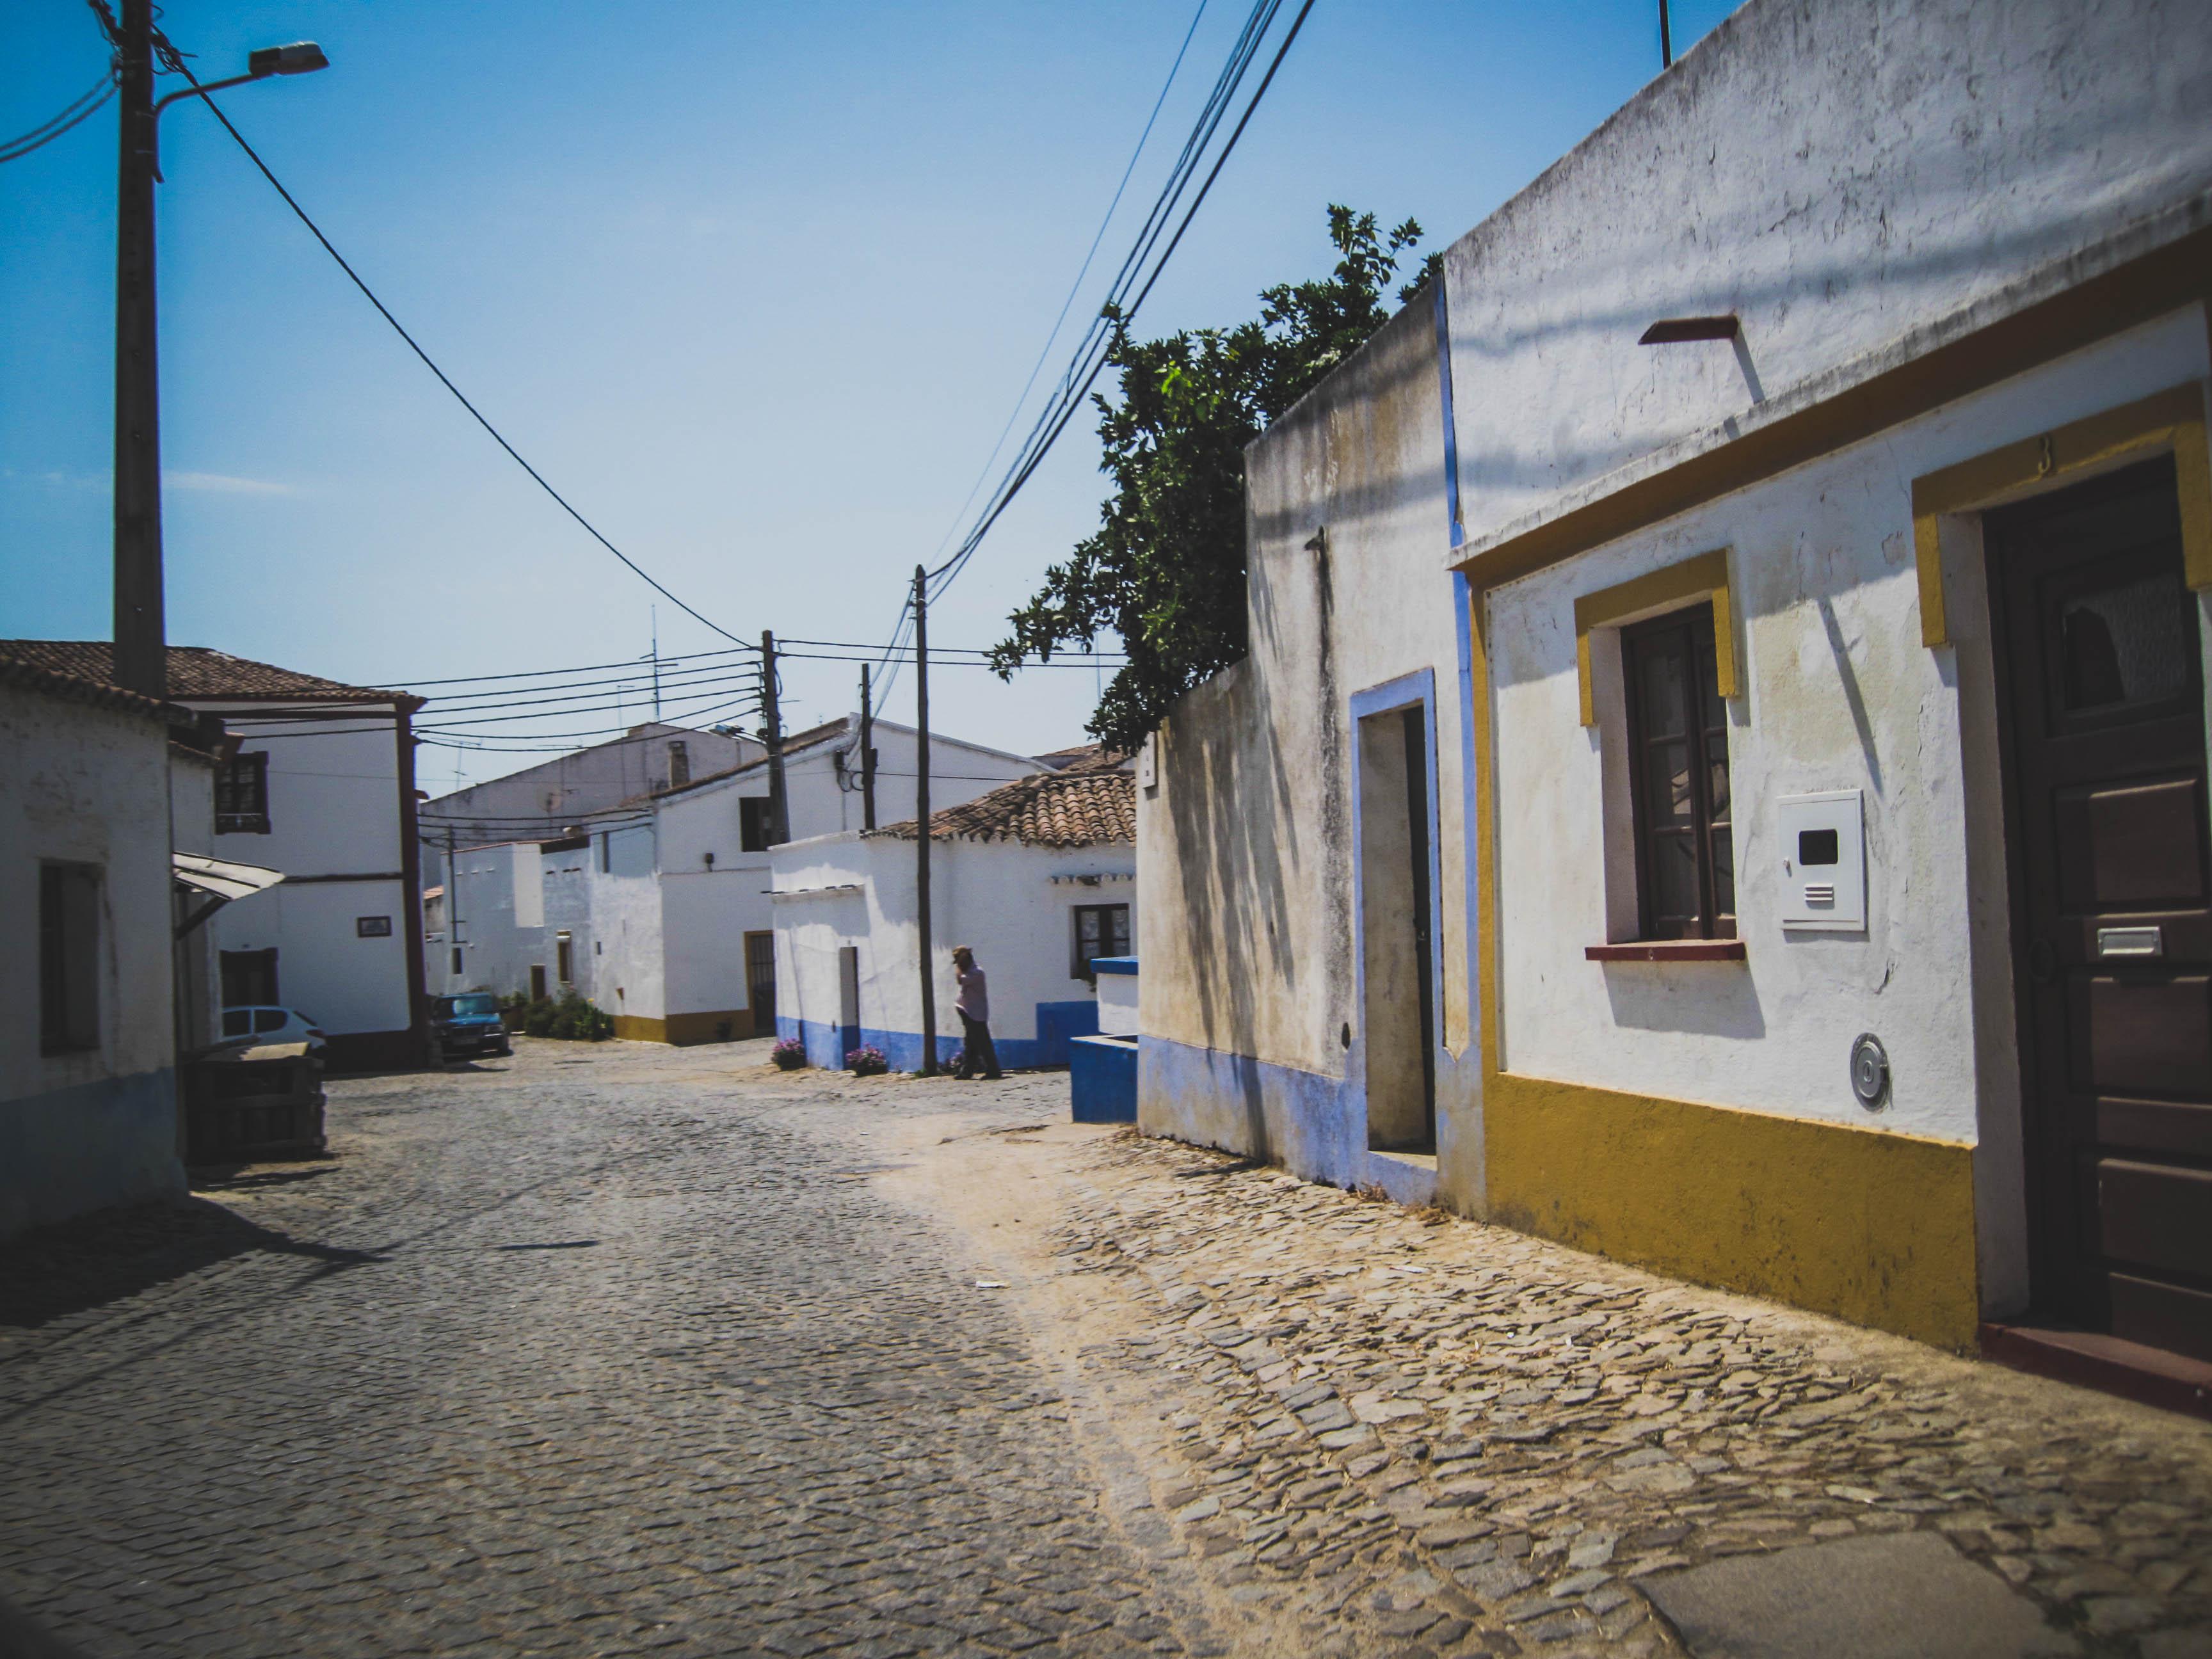 066-portugal